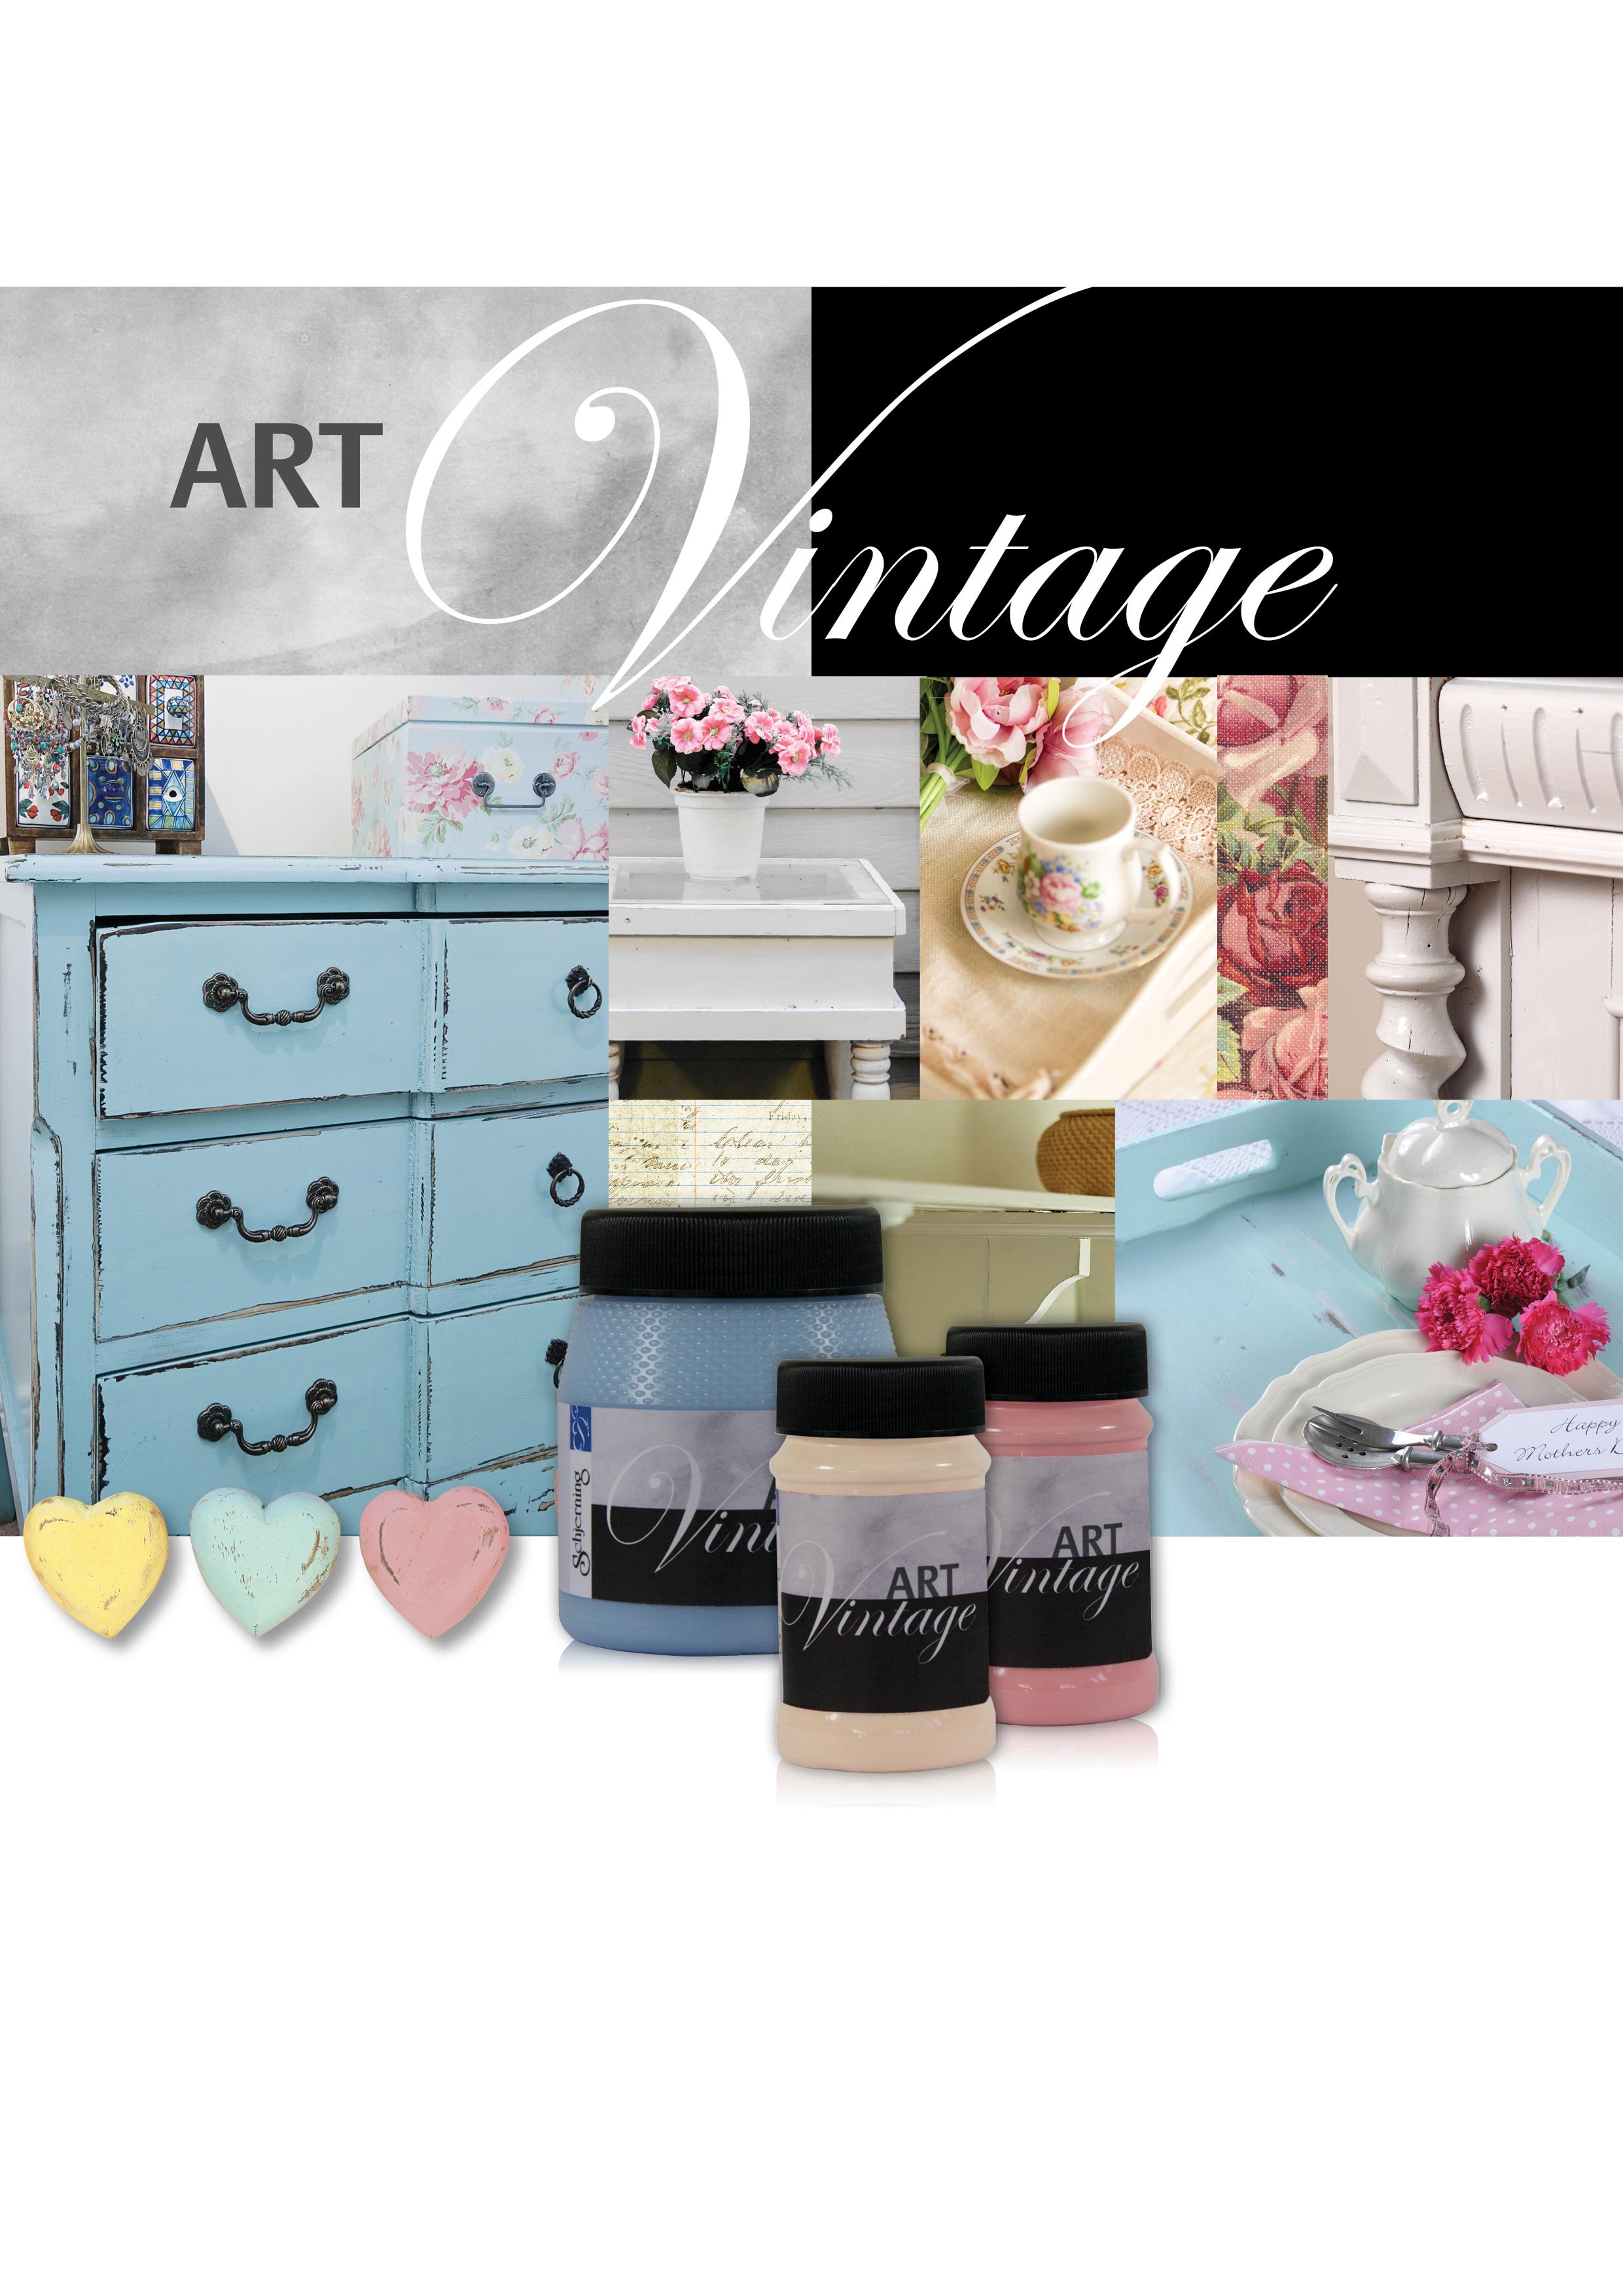 Schjerning Kalkfarbe Art Vintage Vanille